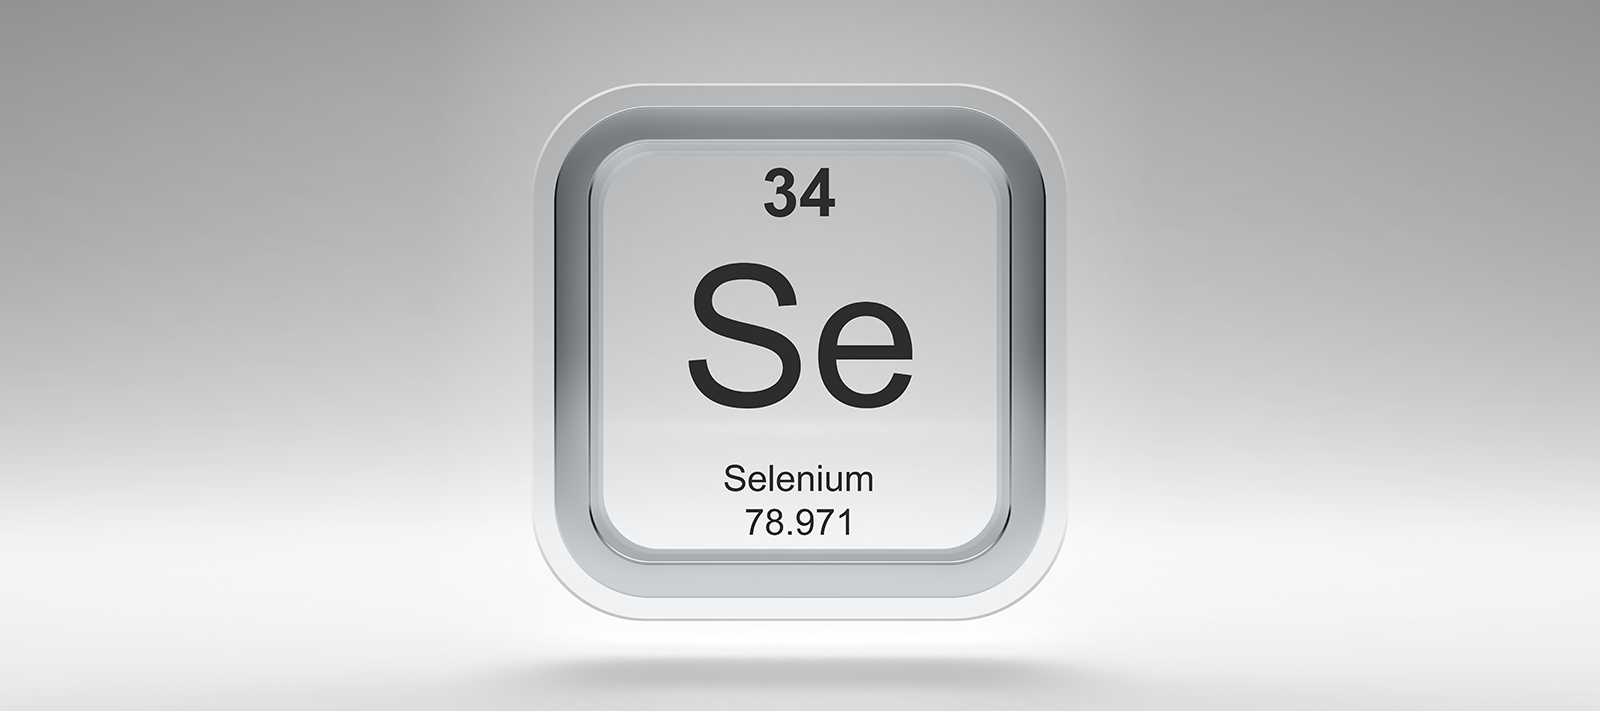 Selenium, Selenoid, Selenide, Selendroid… Что все это значит? - 1